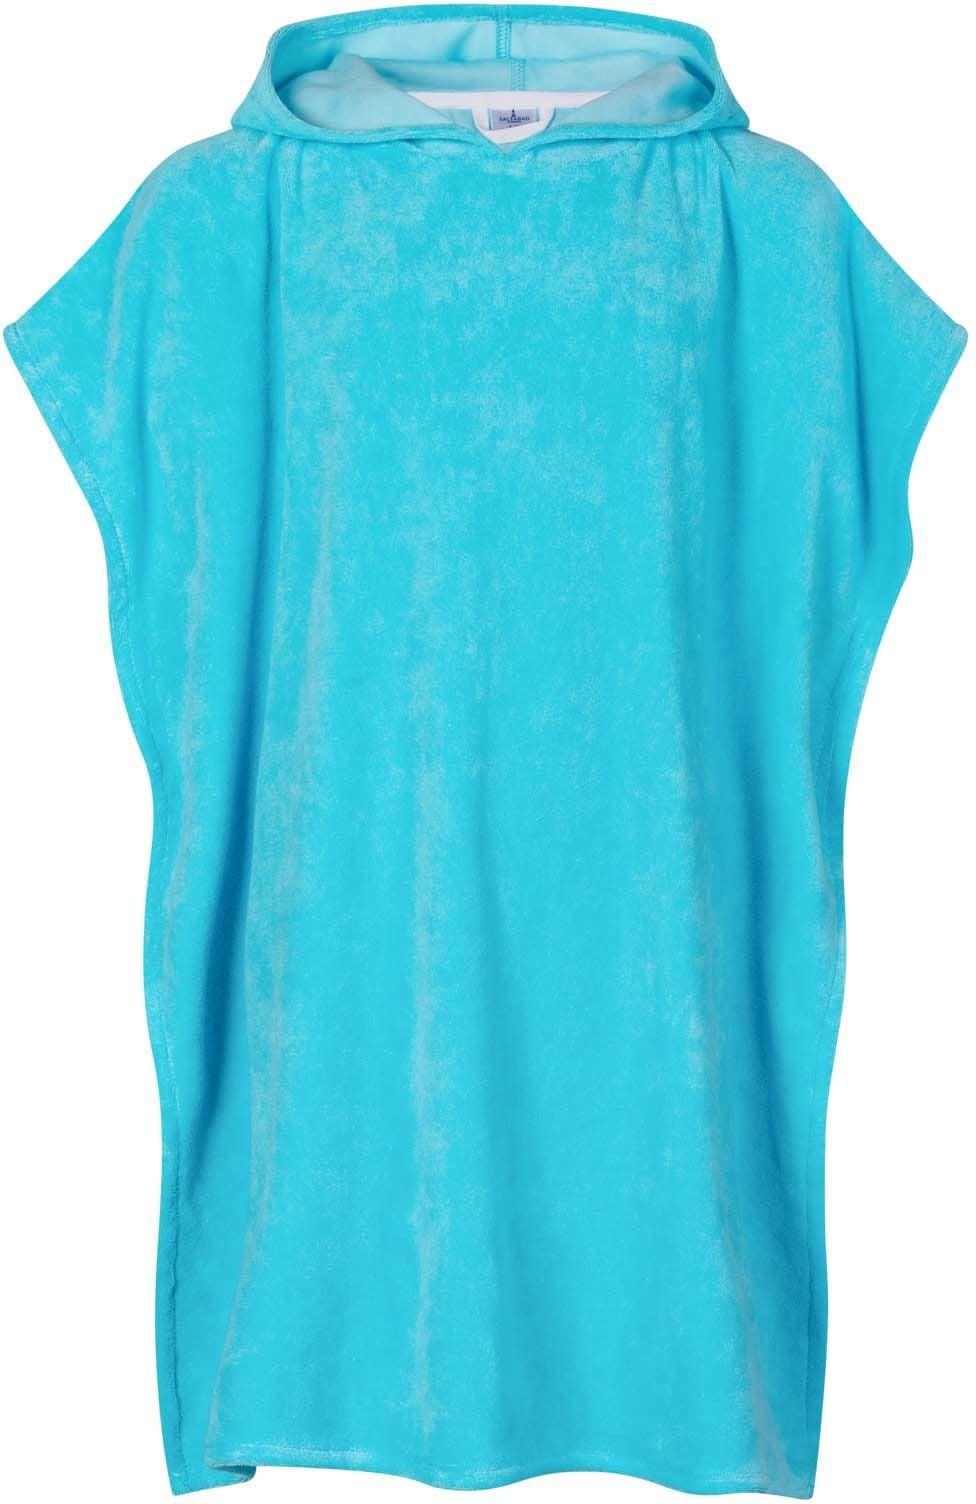 Saltabad Apelviken Badponcho, Turquoise, 2-4 År